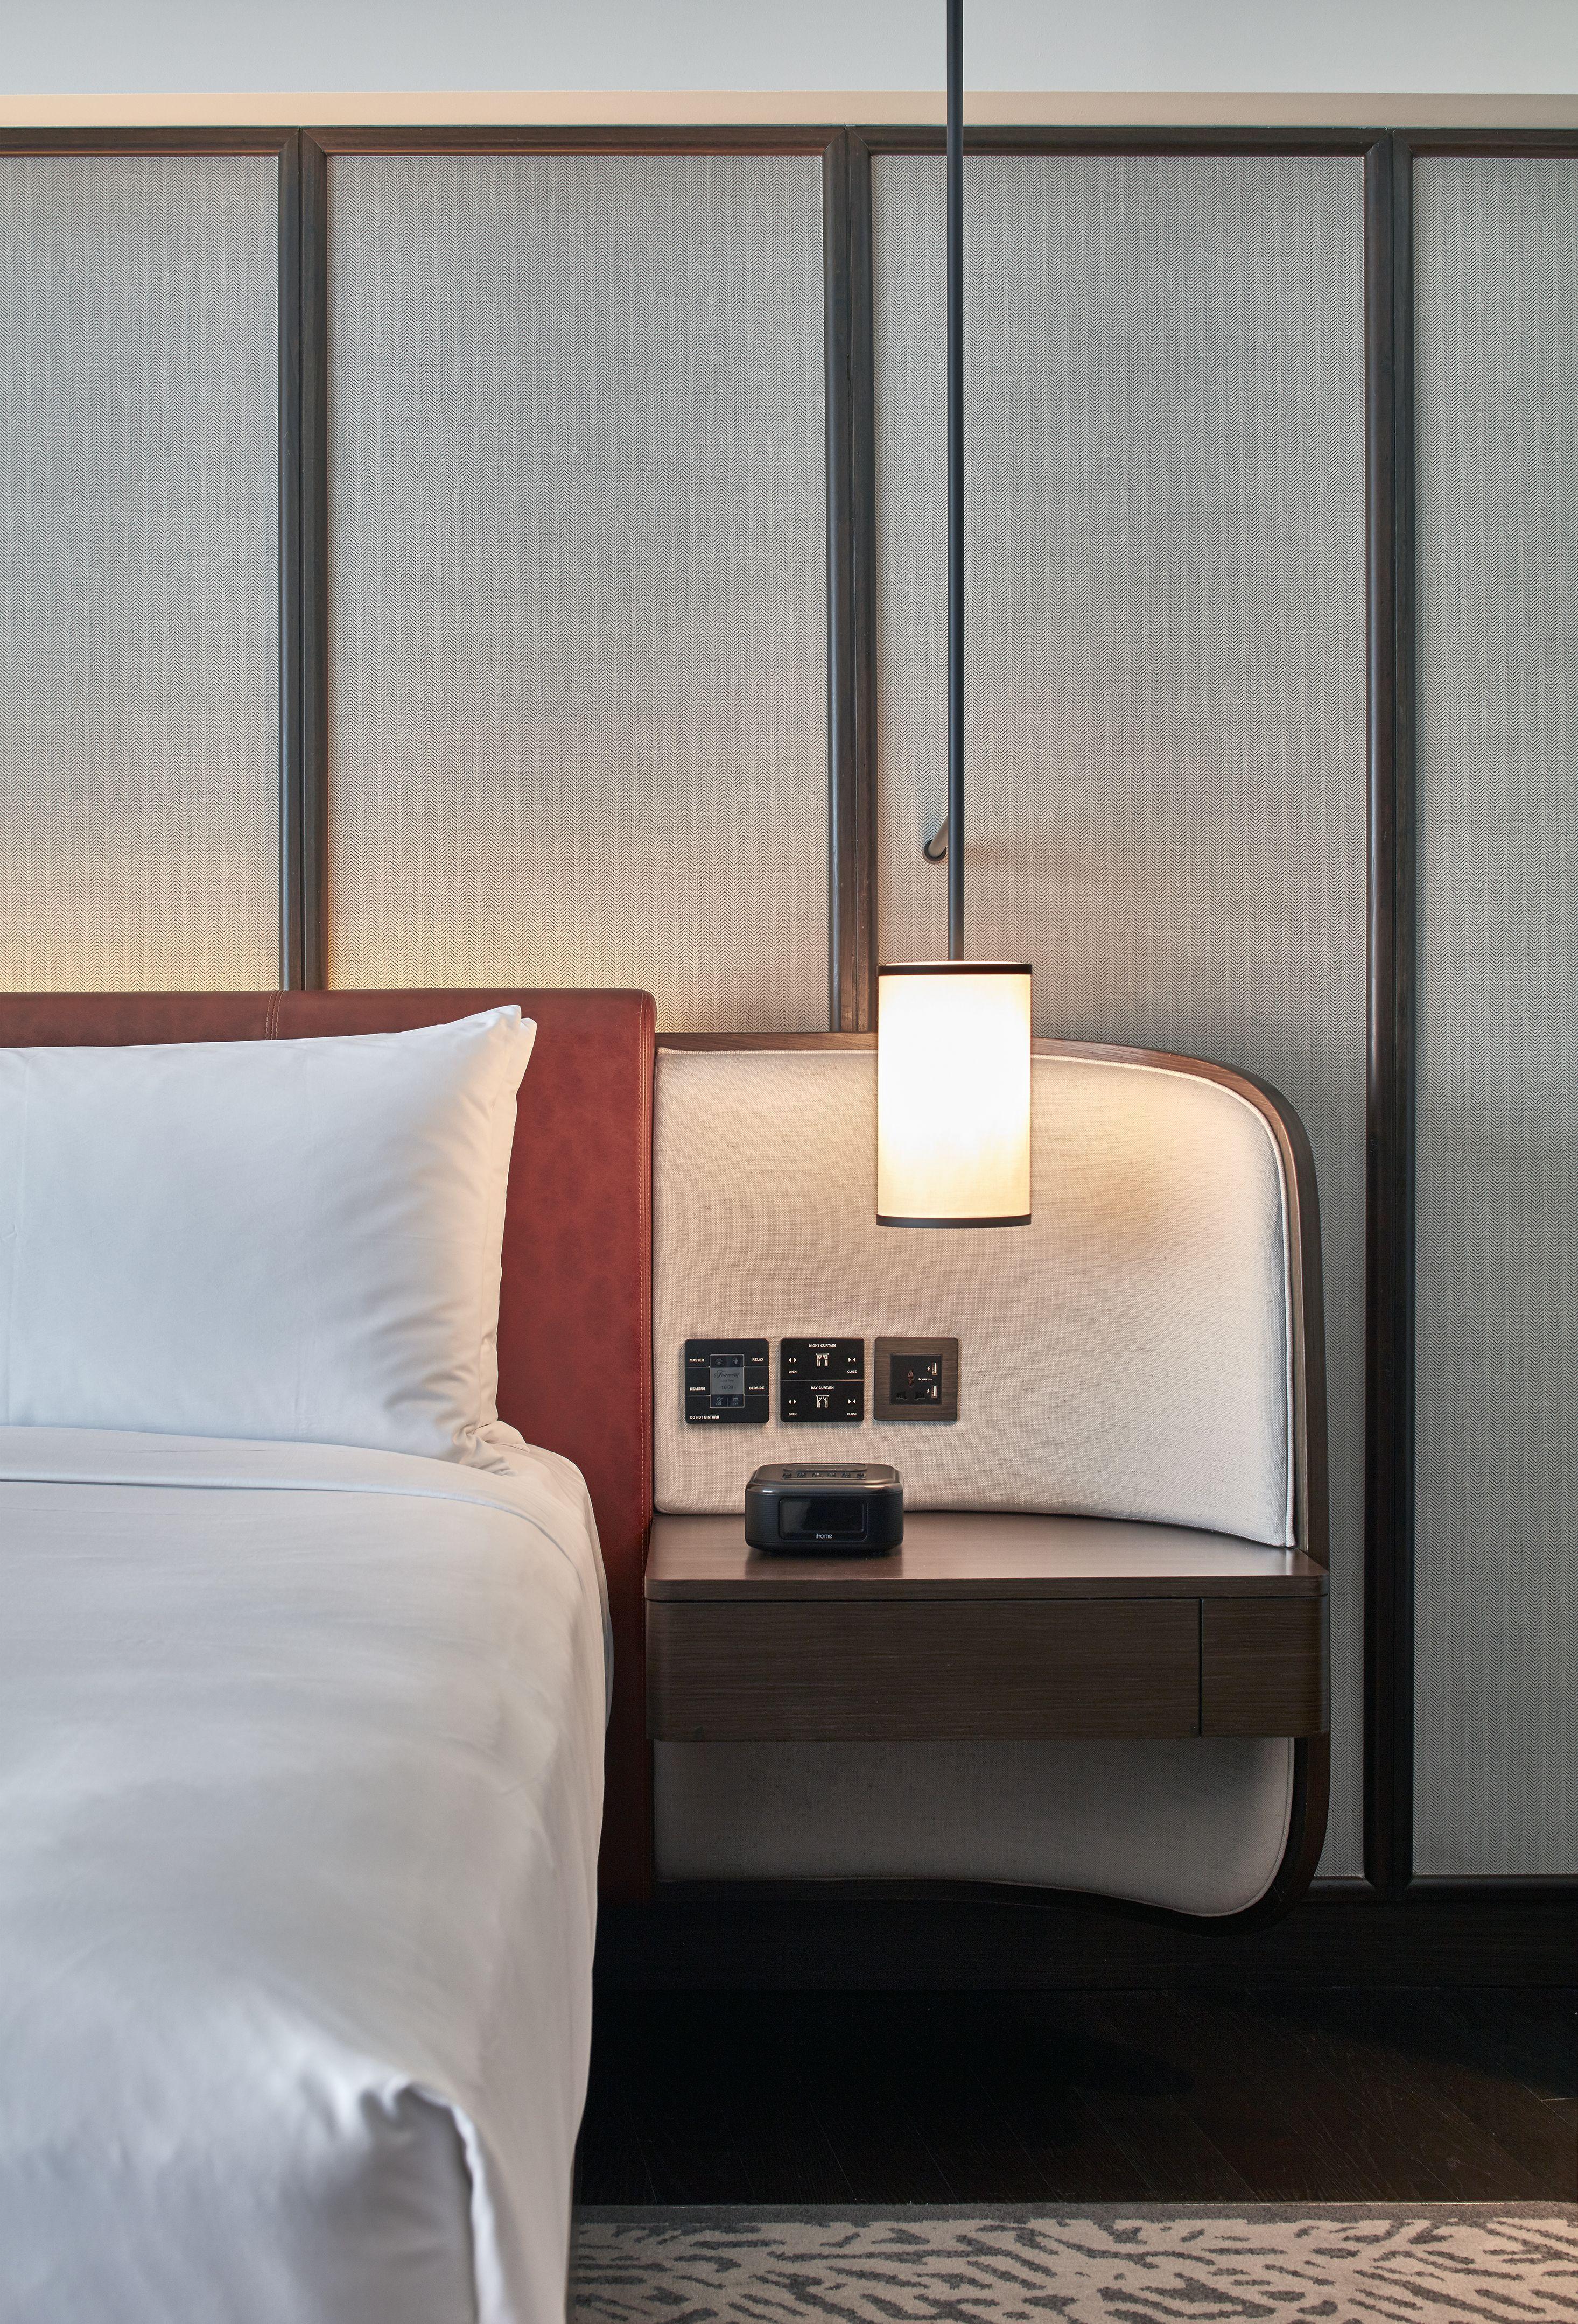 Hotel Room Accessories